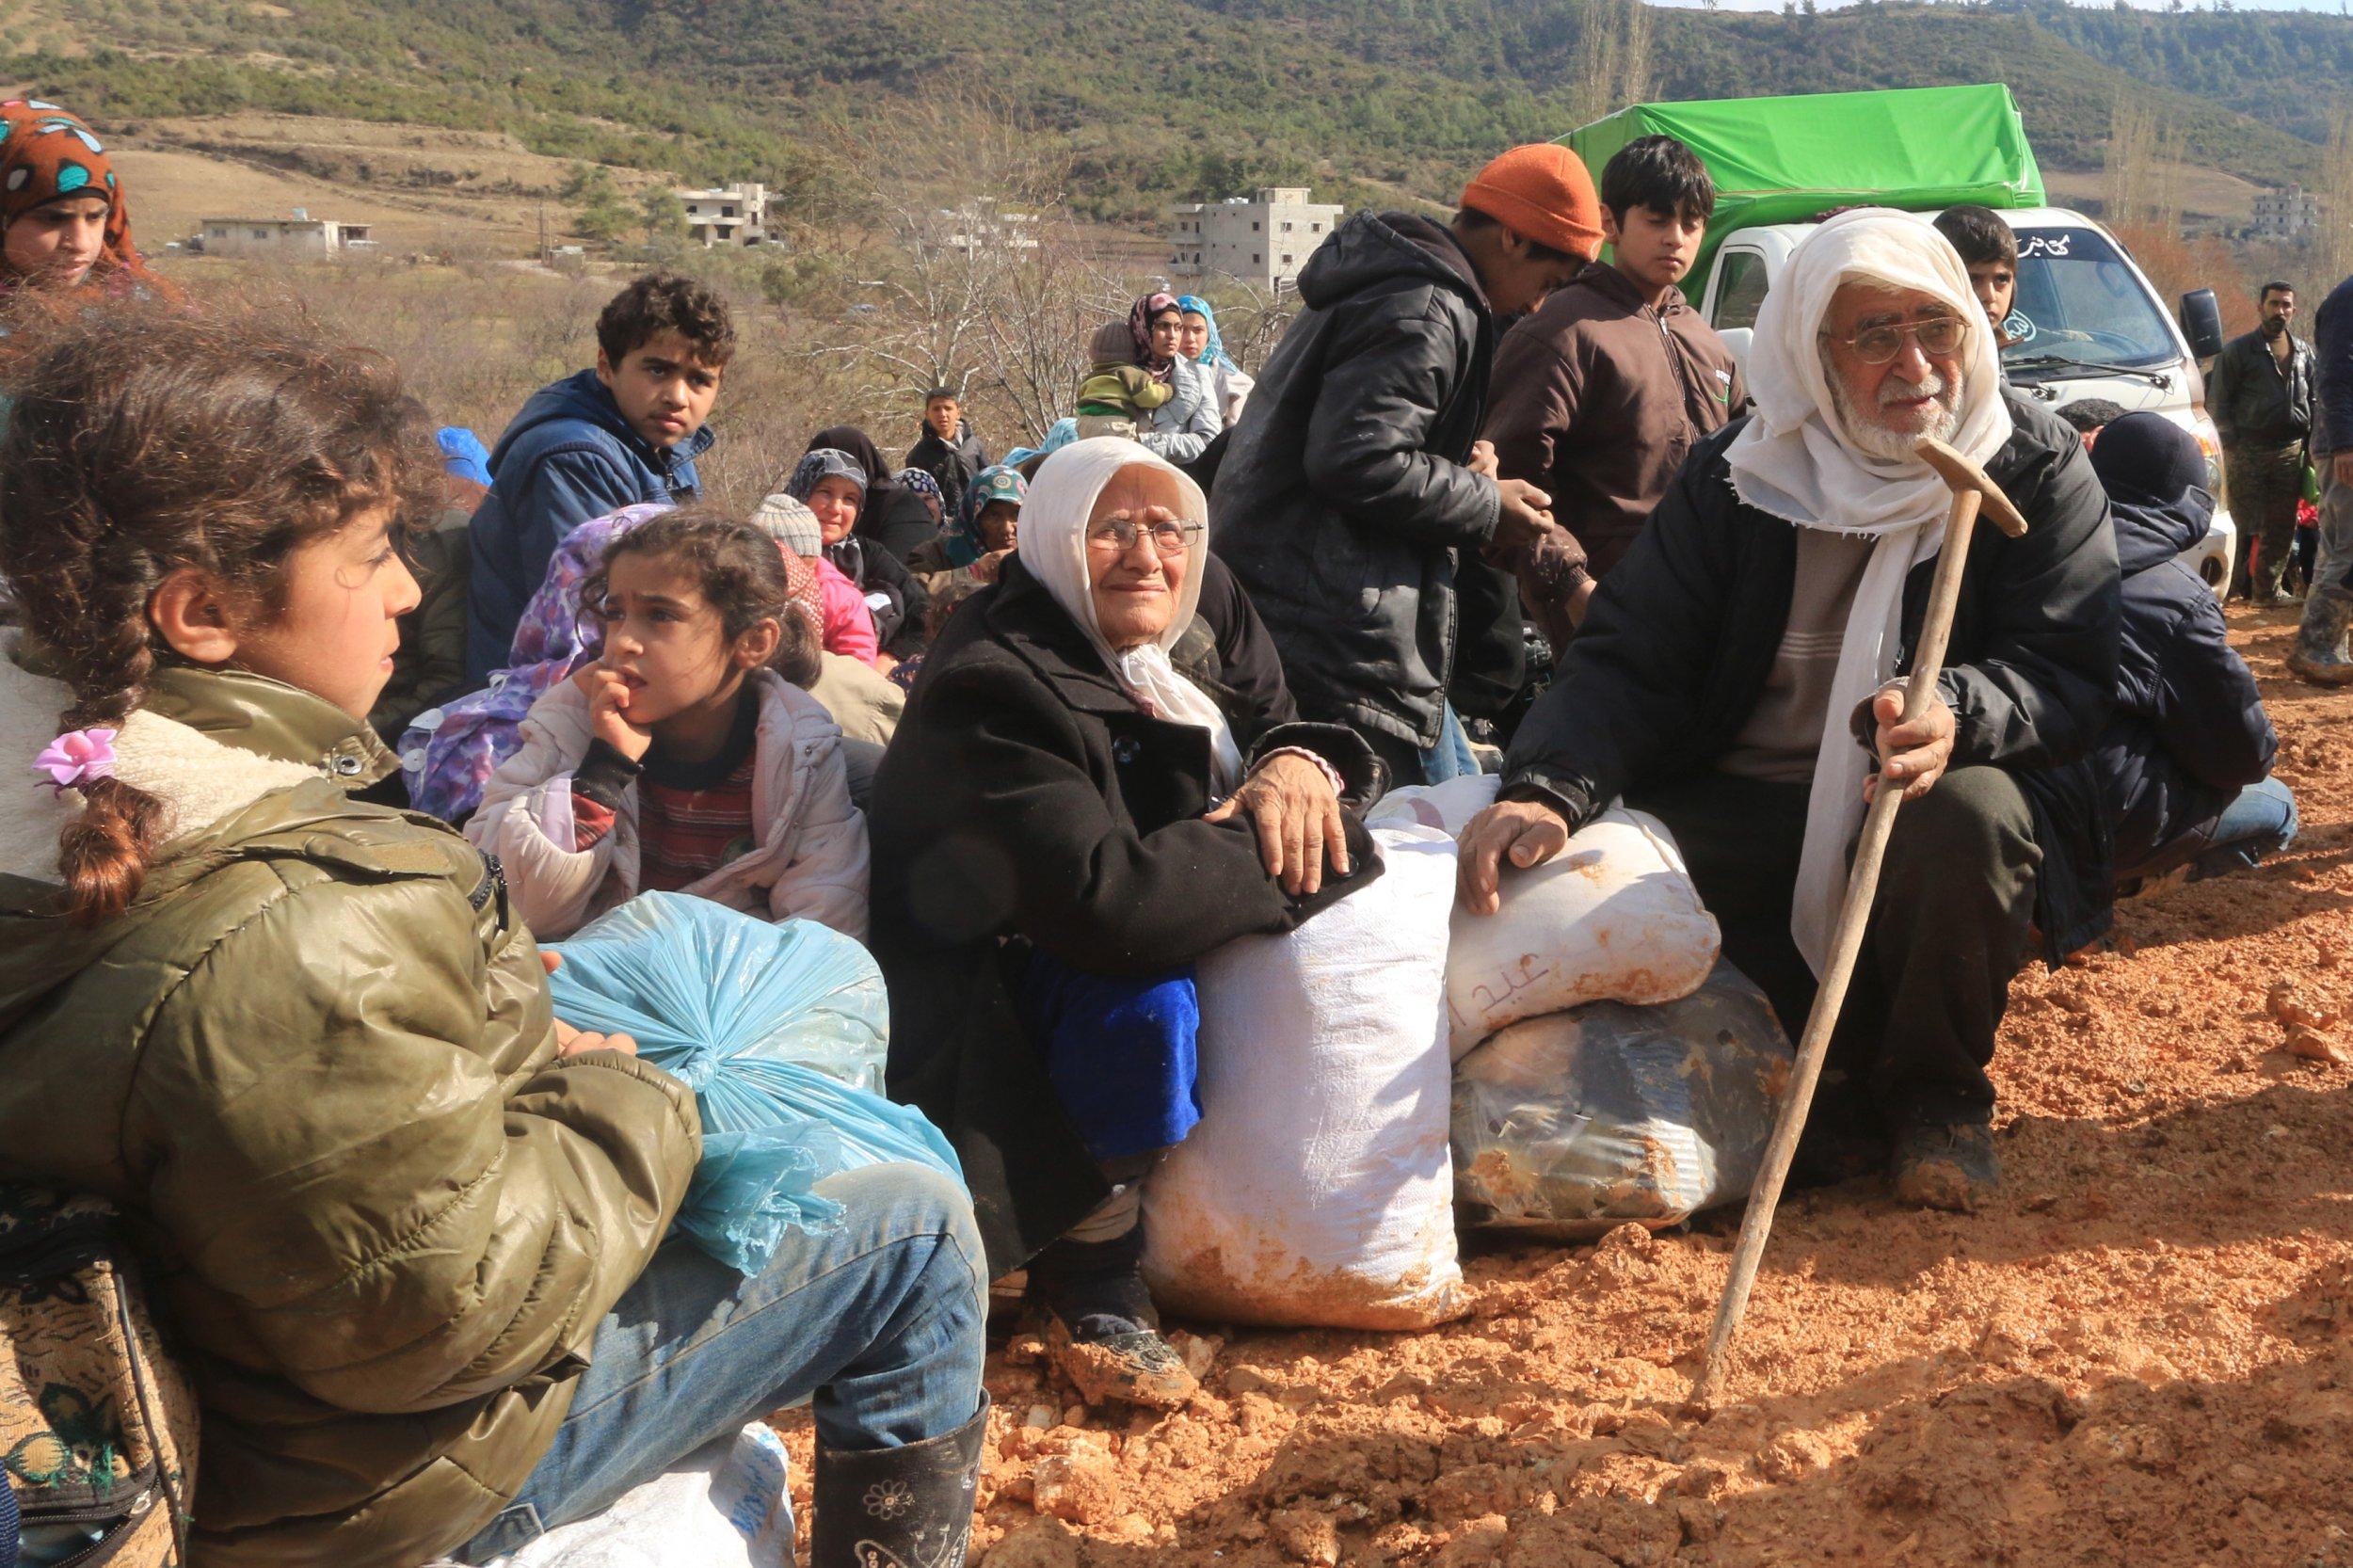 02_03_syrian_refugees_01